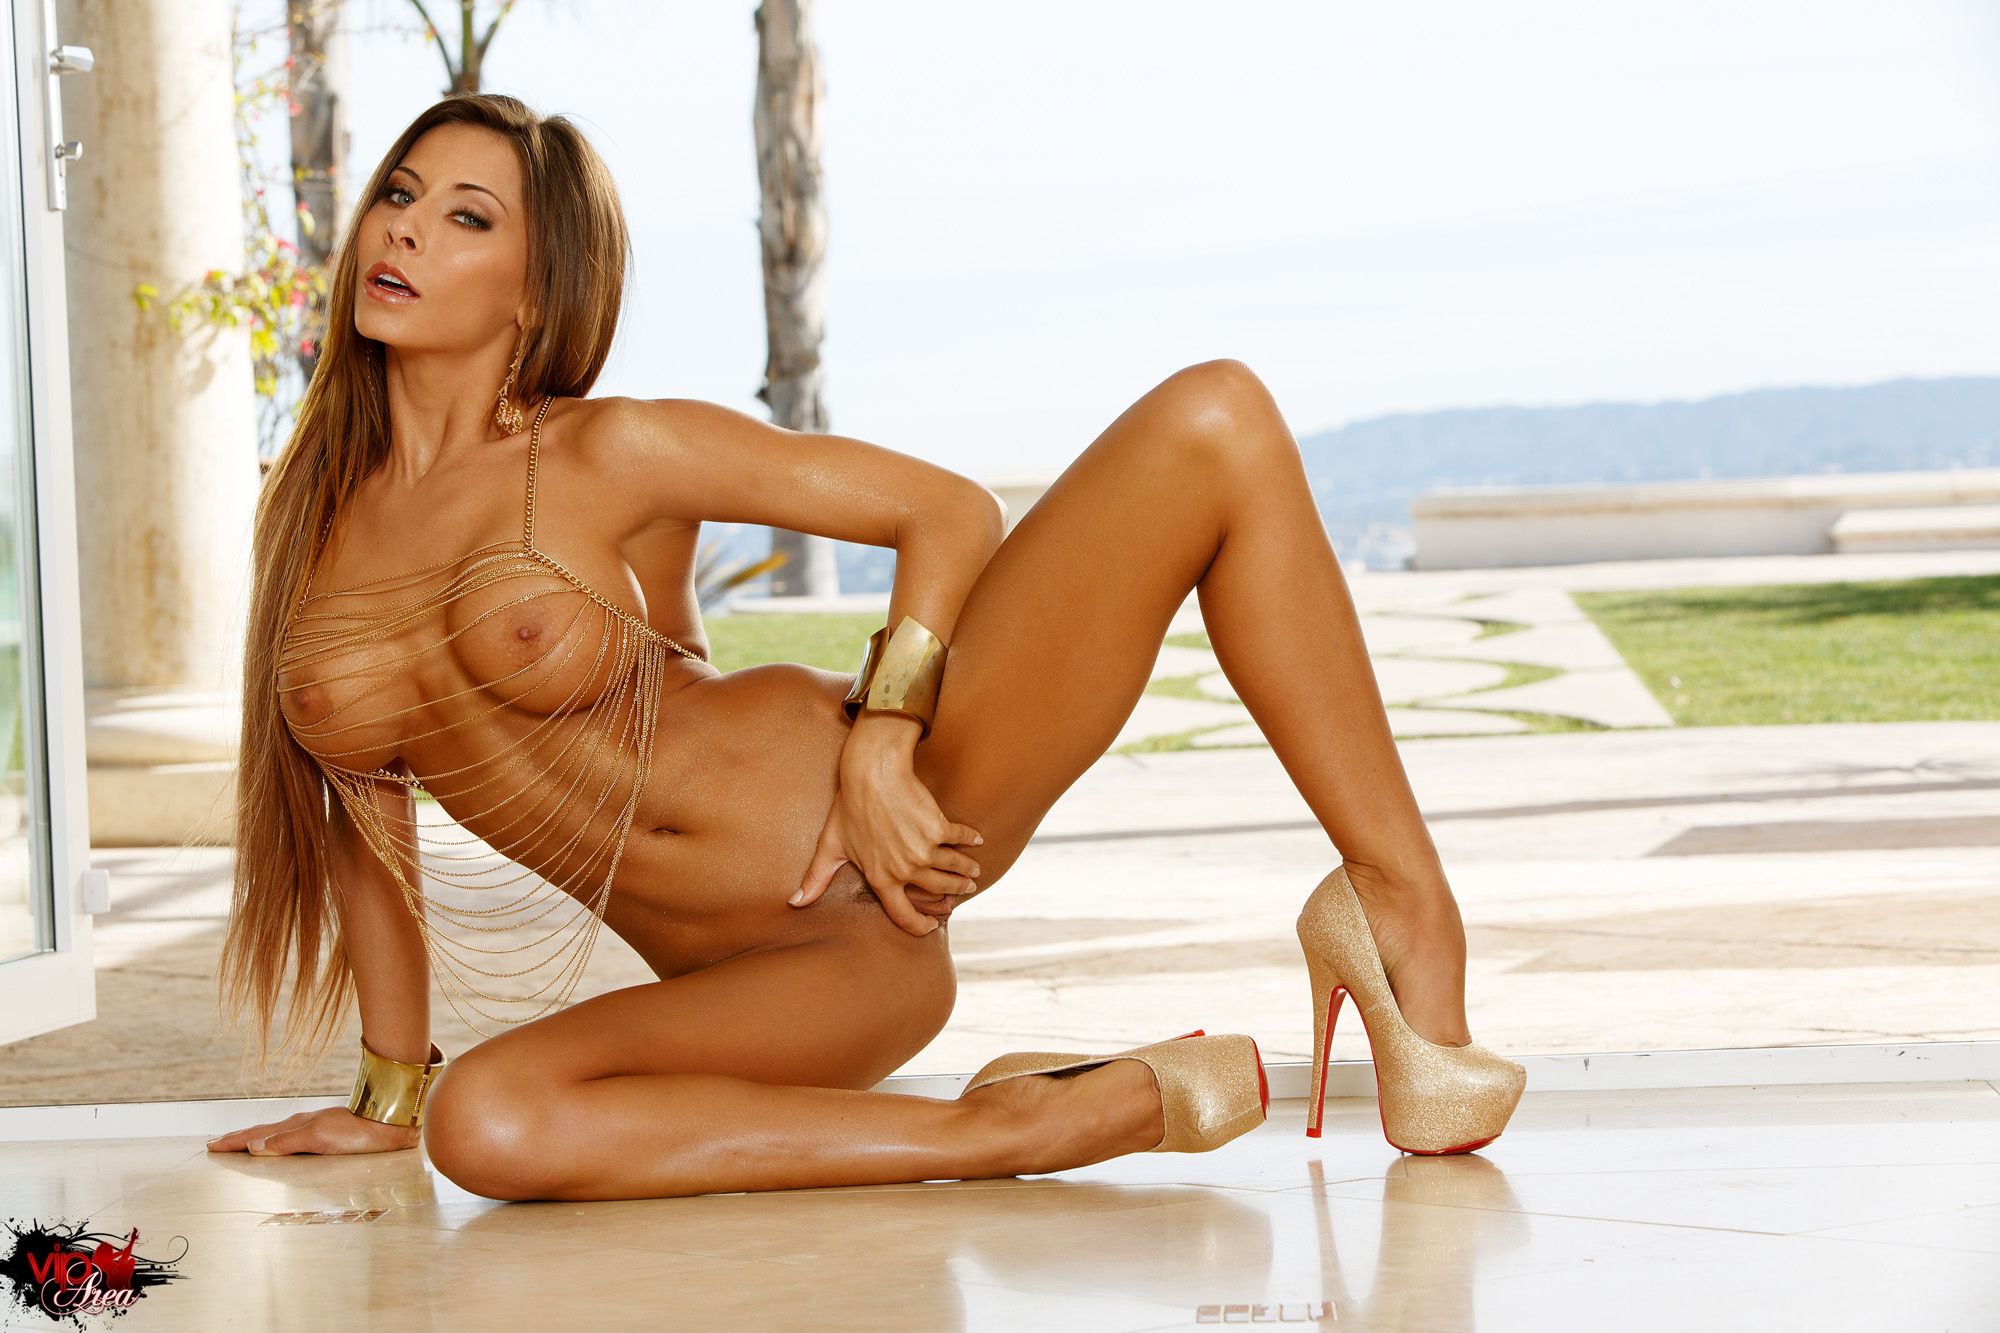 Kelly Madison Pics  Babes and Pornstars